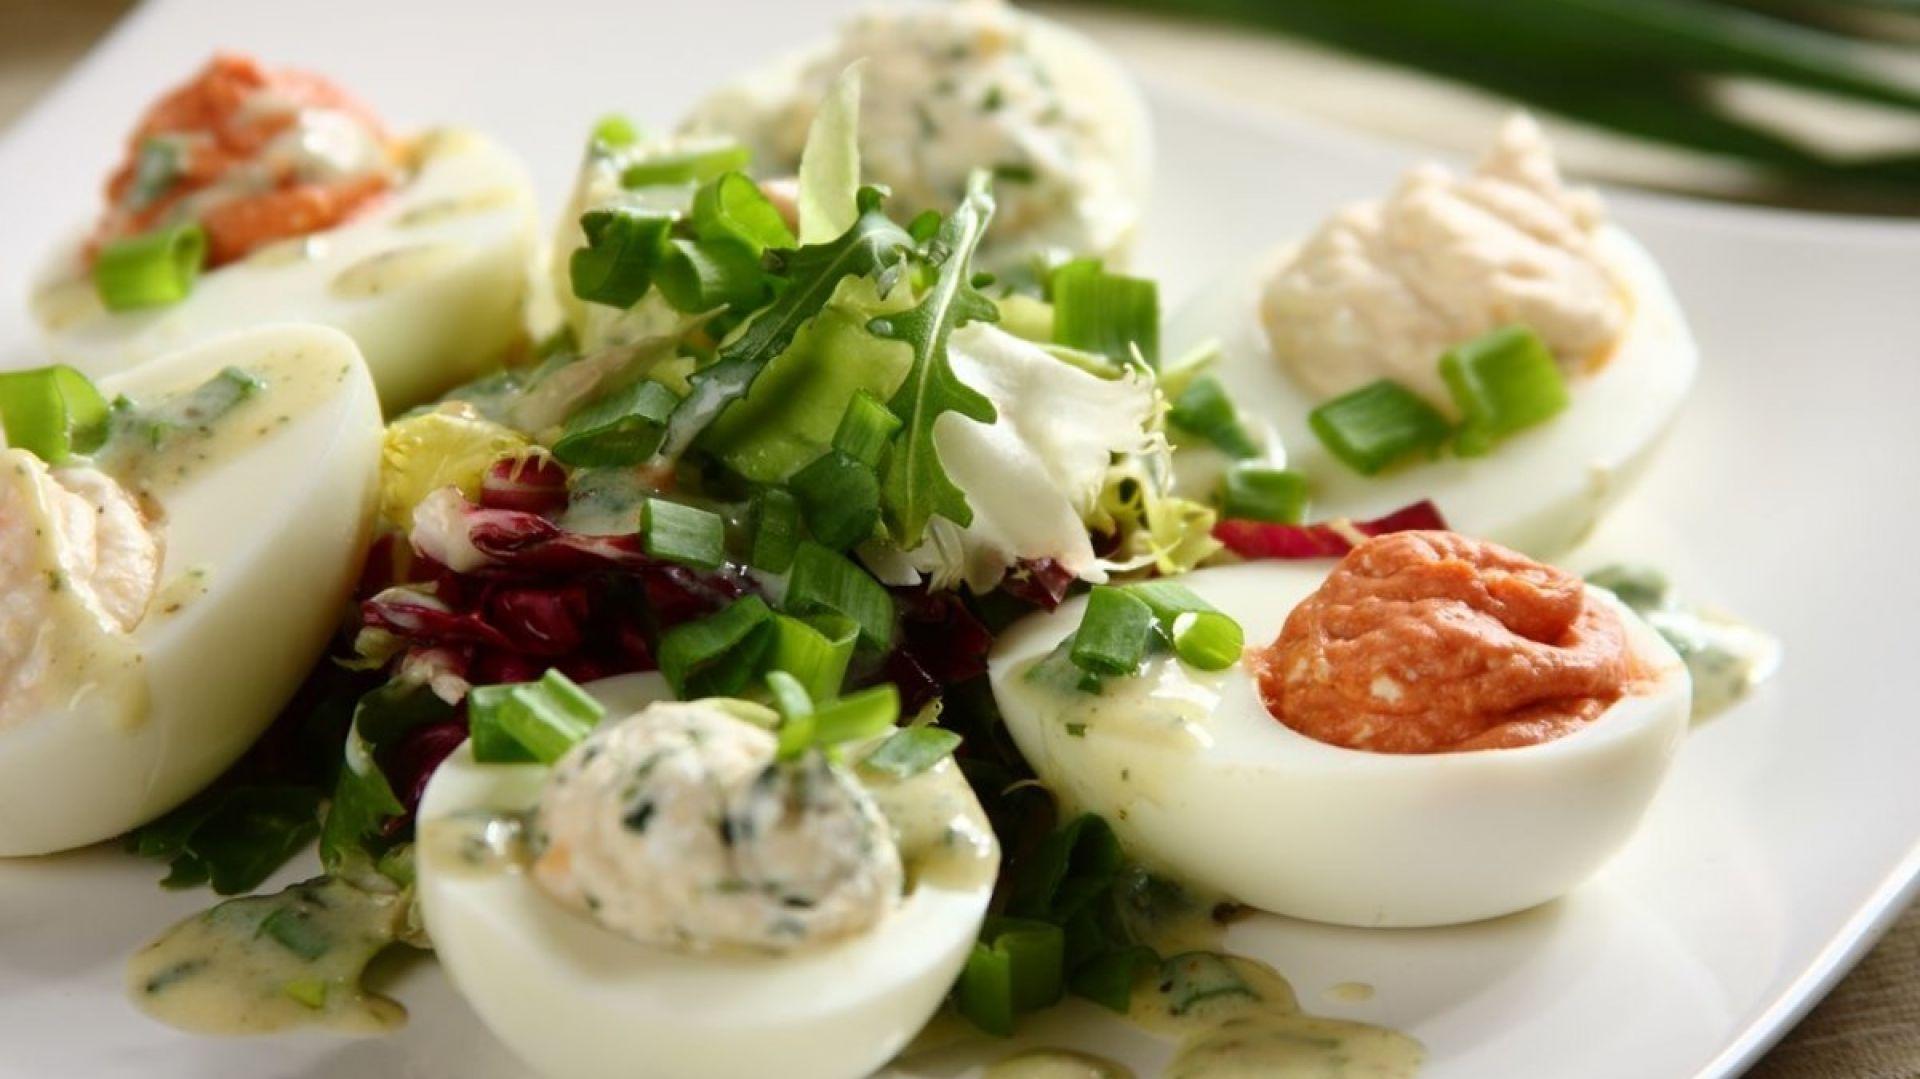 Jajko faszerowane. Fot. Knorr